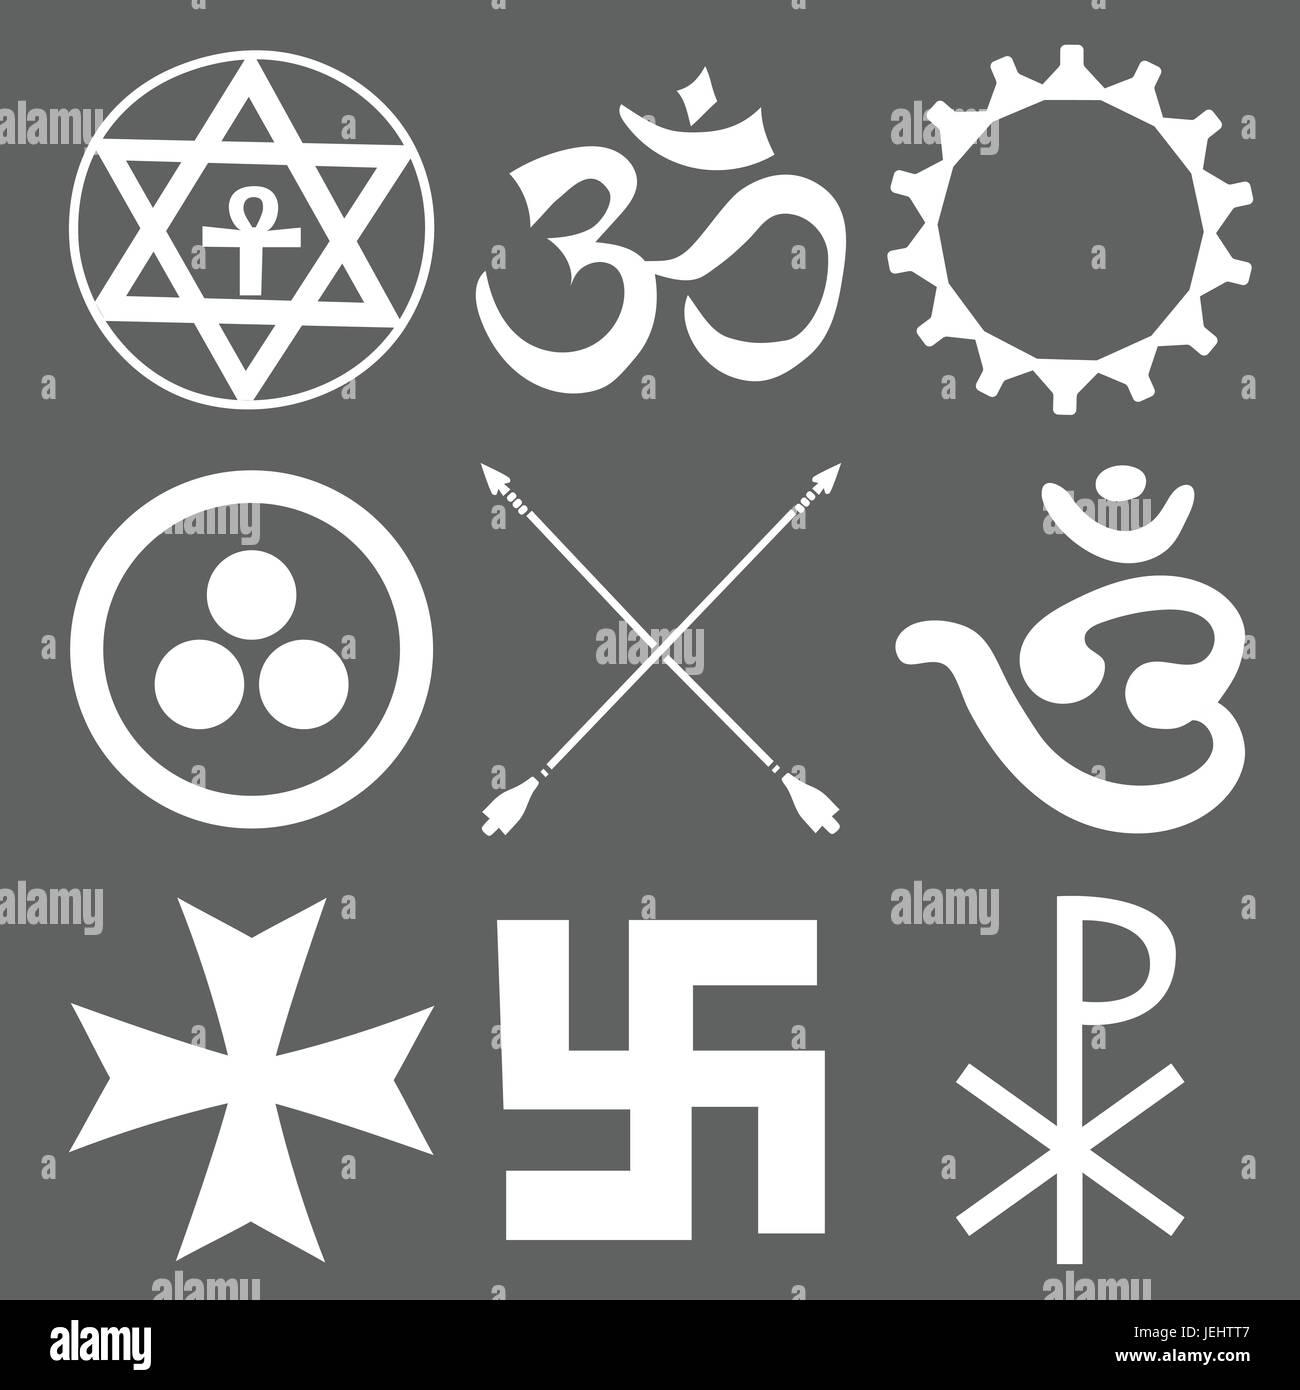 Masonic Symbols Stock Vector Images Alamy